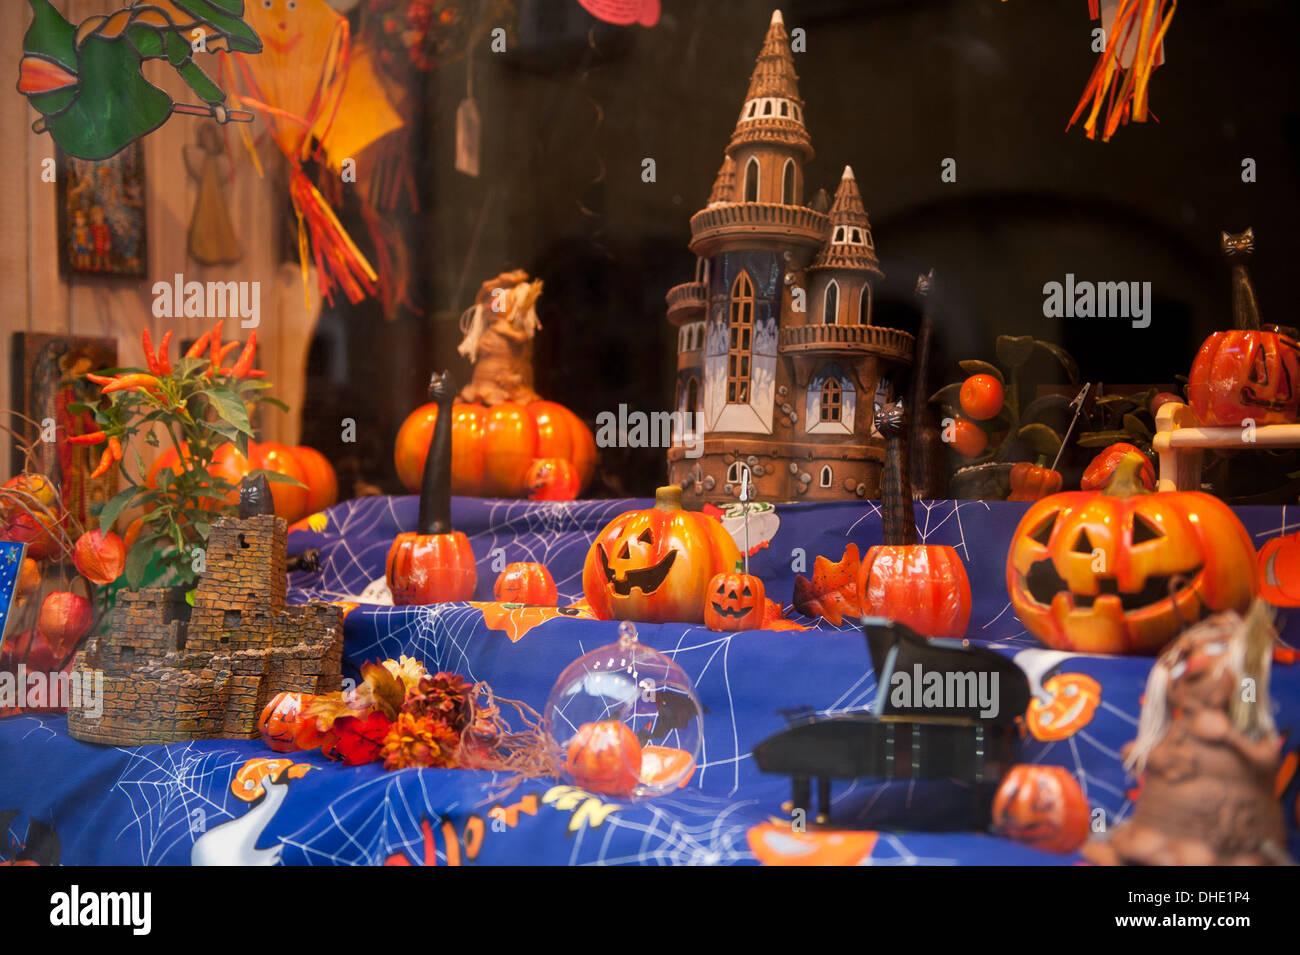 pumpkins and castle in shop window exposure Stock Photo